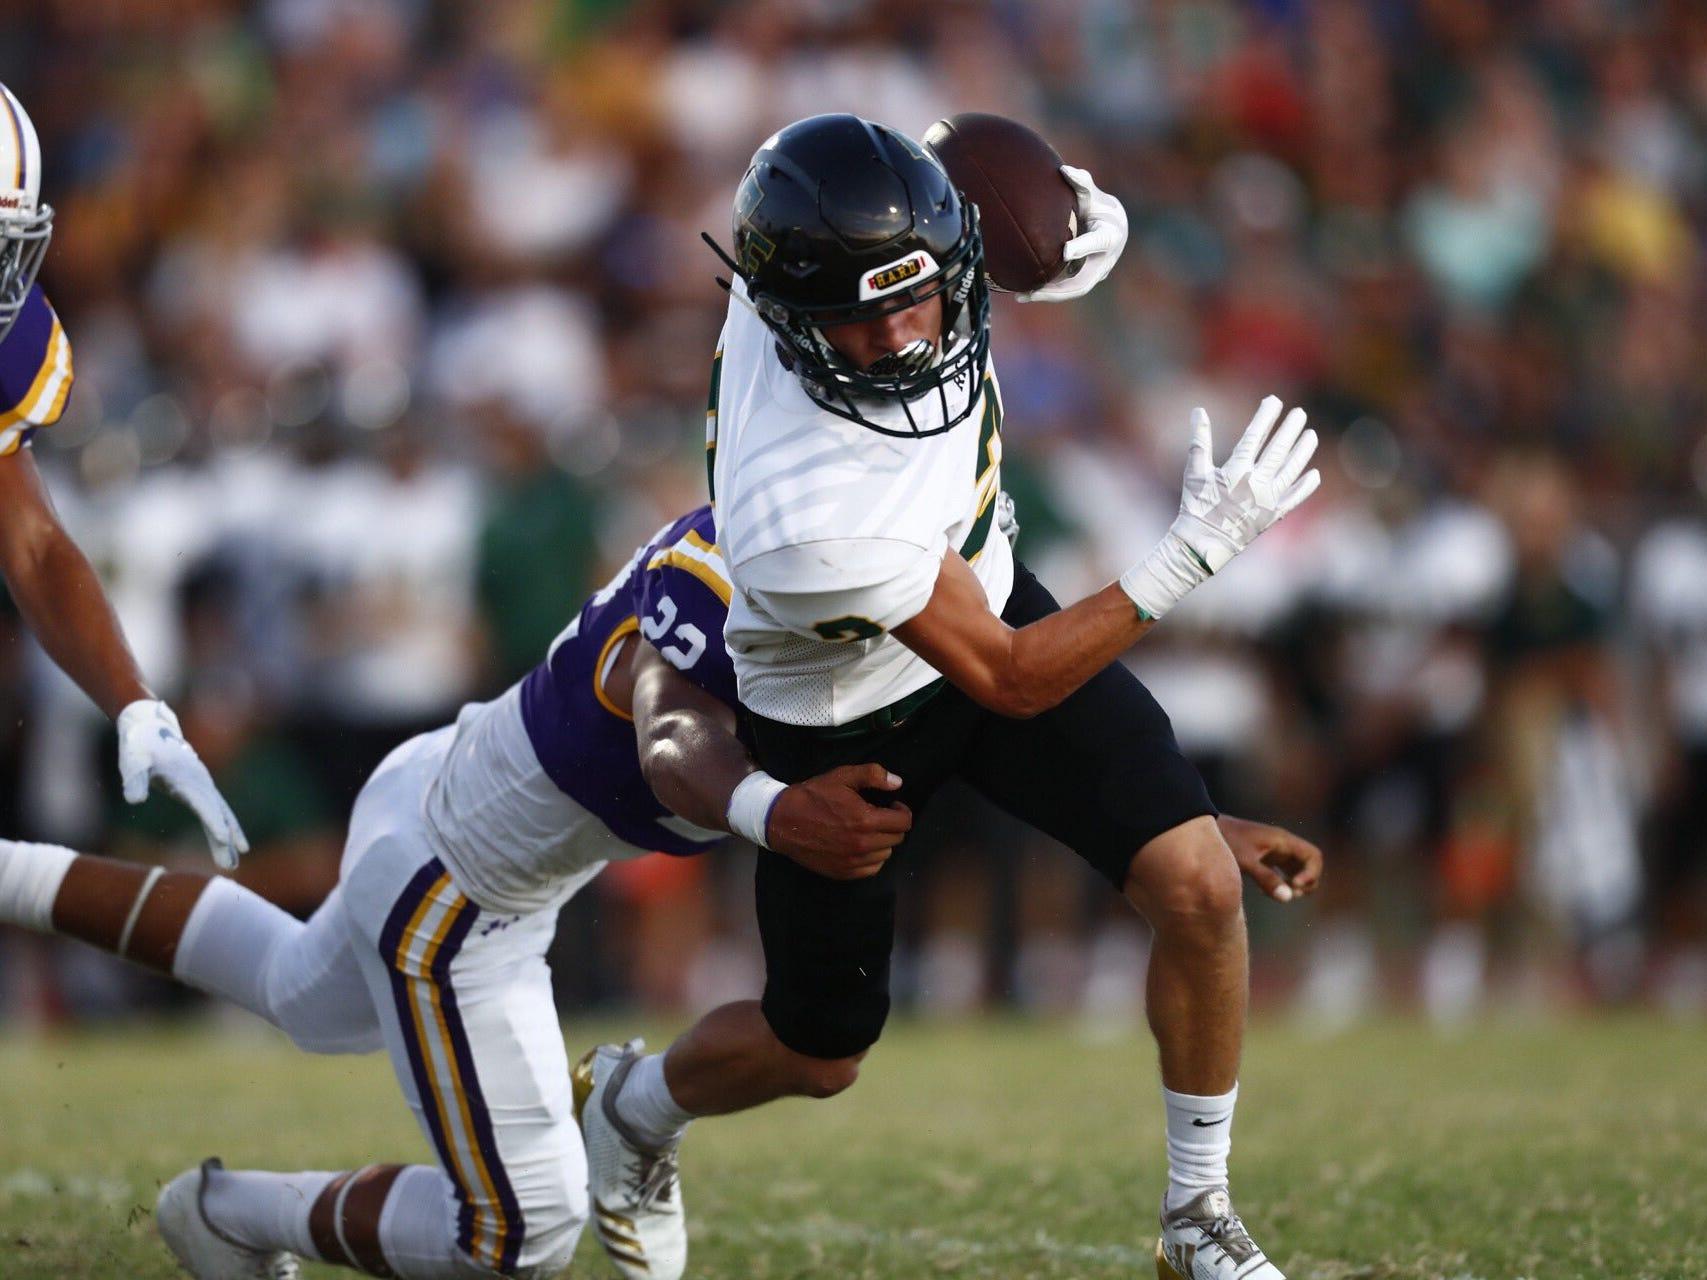 Rockport-Fulton Pirates battle the Aransas Pass Panthers in their high school football season opener at Bo Bonorden Stadium in Aransas Pass.